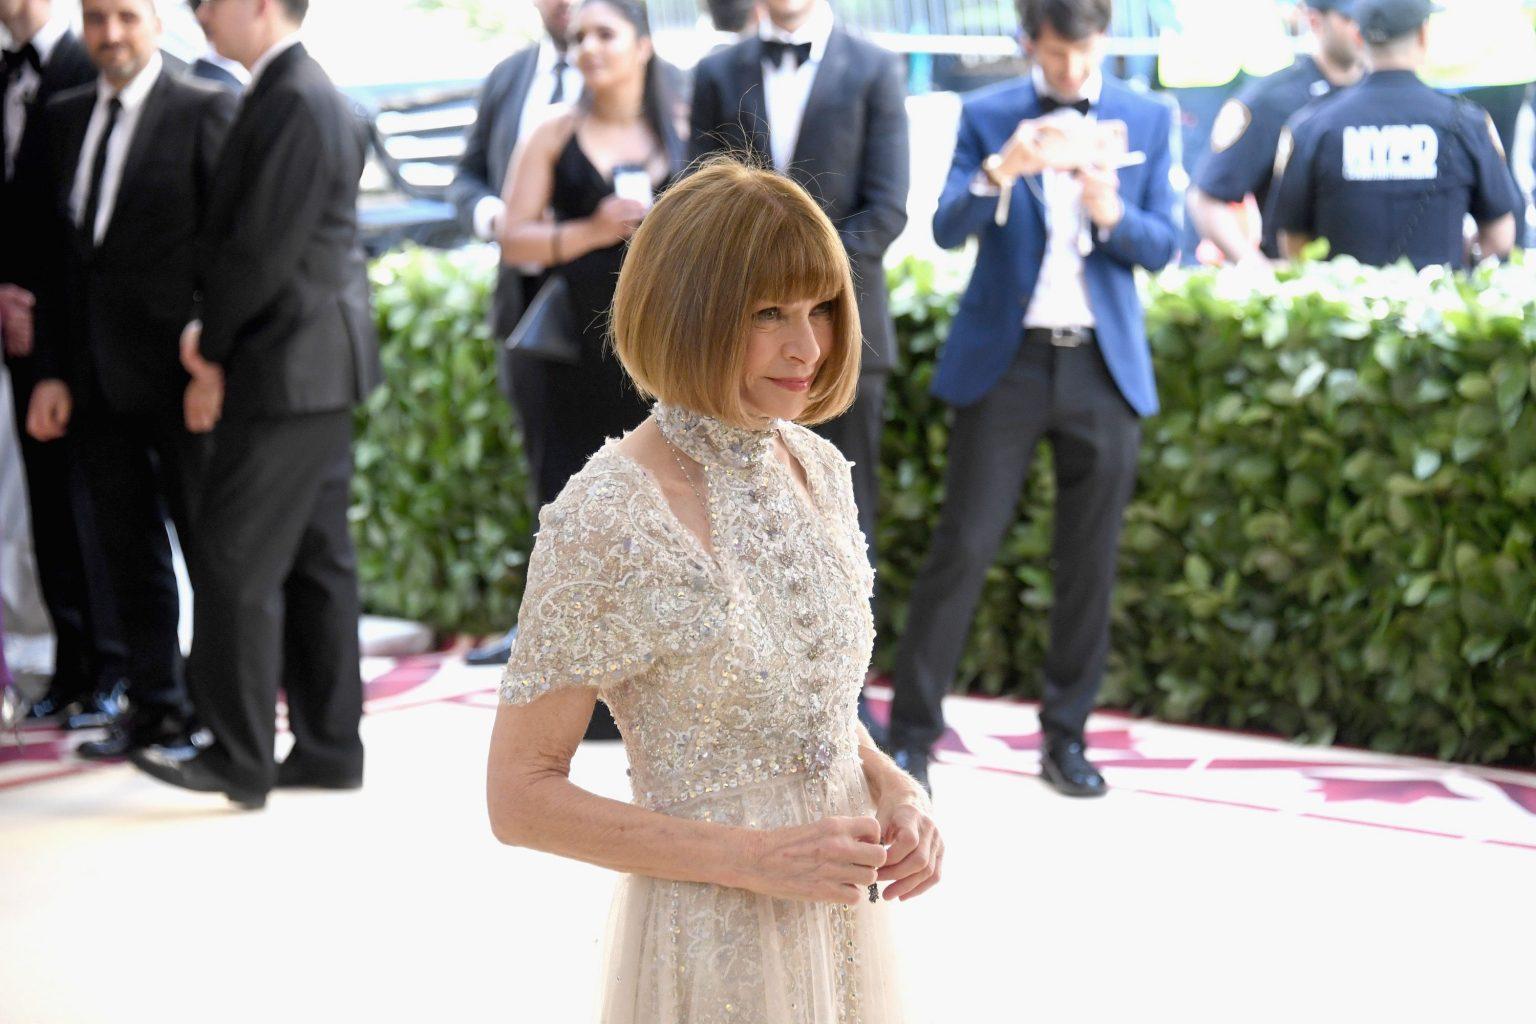 Kryeredaktorja e Vogue se mban fjalën, befason adhuruesit